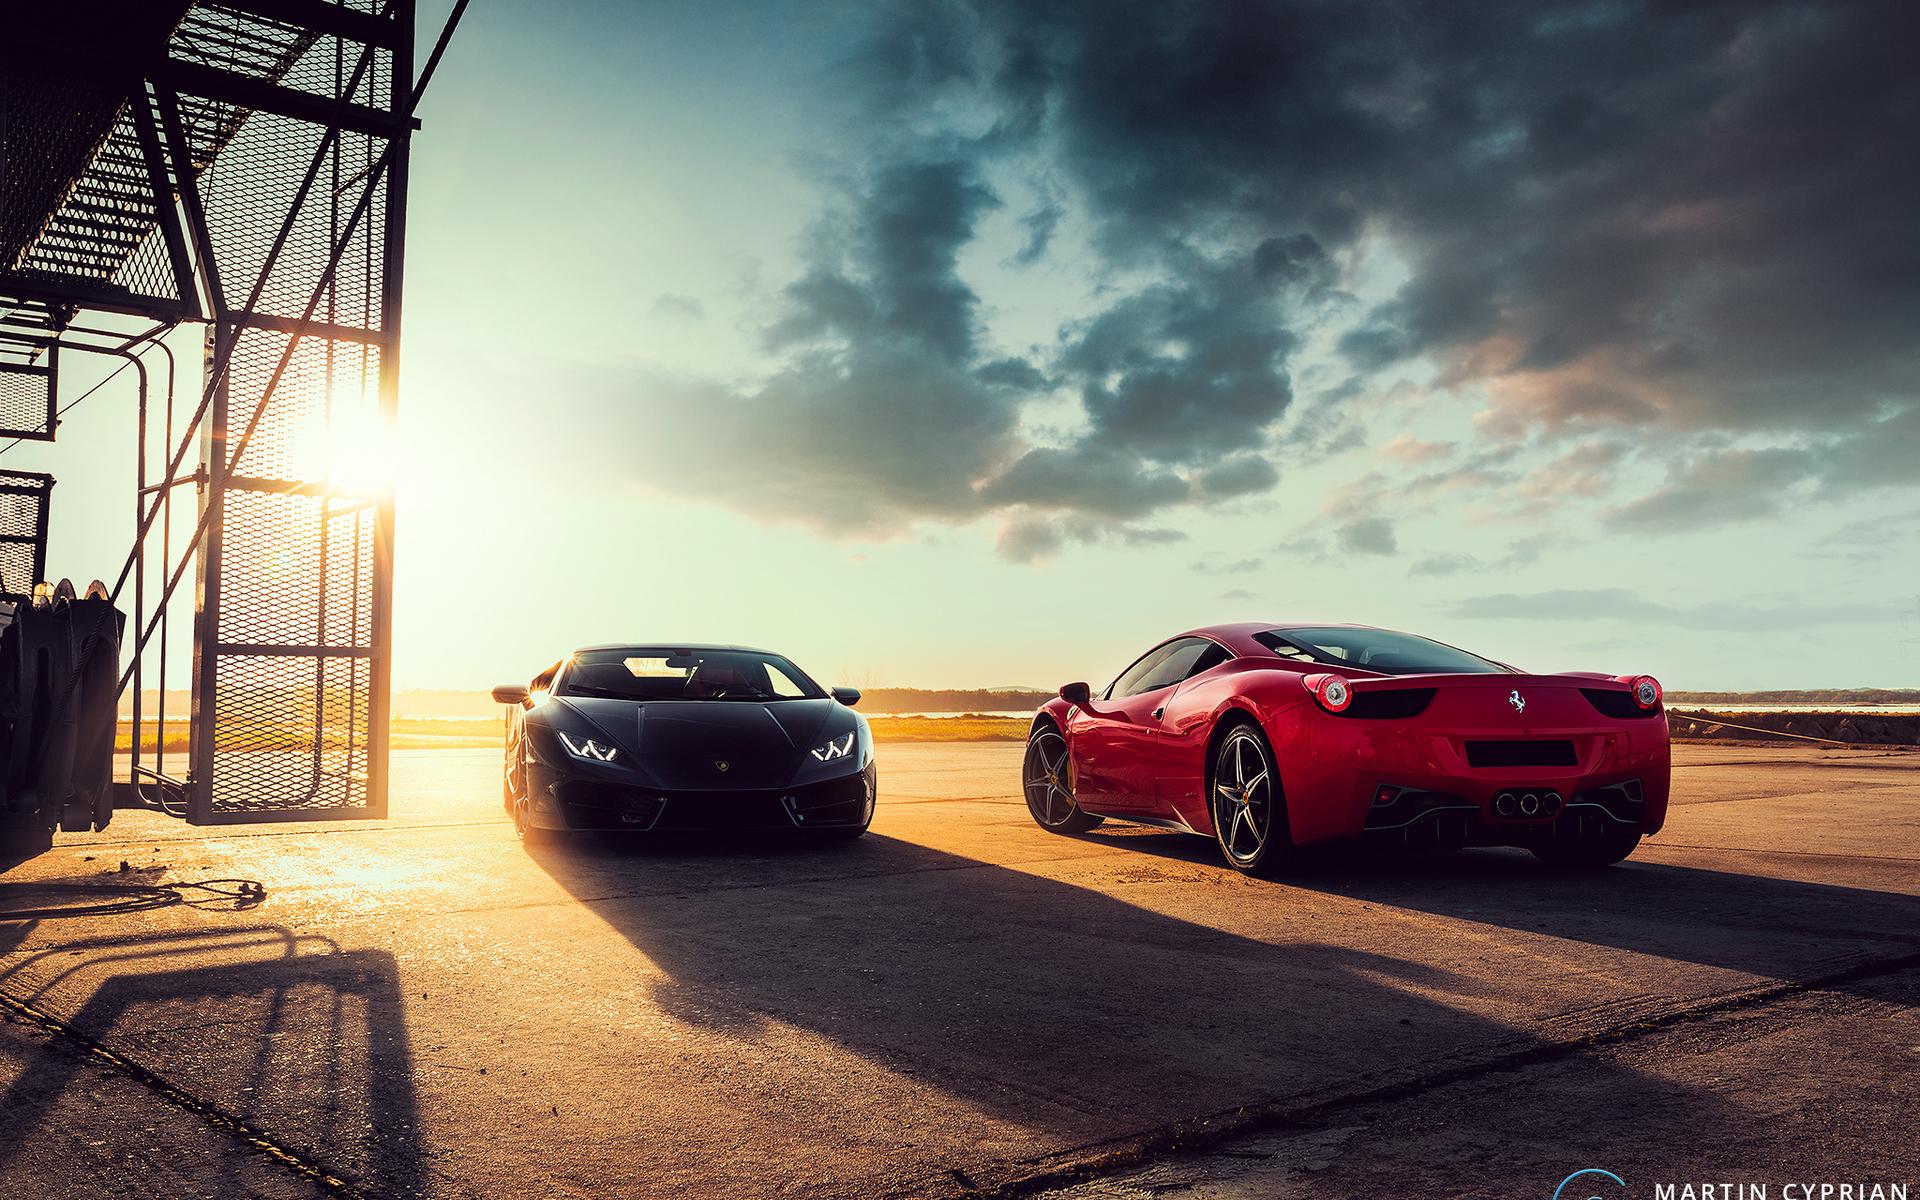 Black Lamborghini Huracan And Ferrari 458 Red Ww